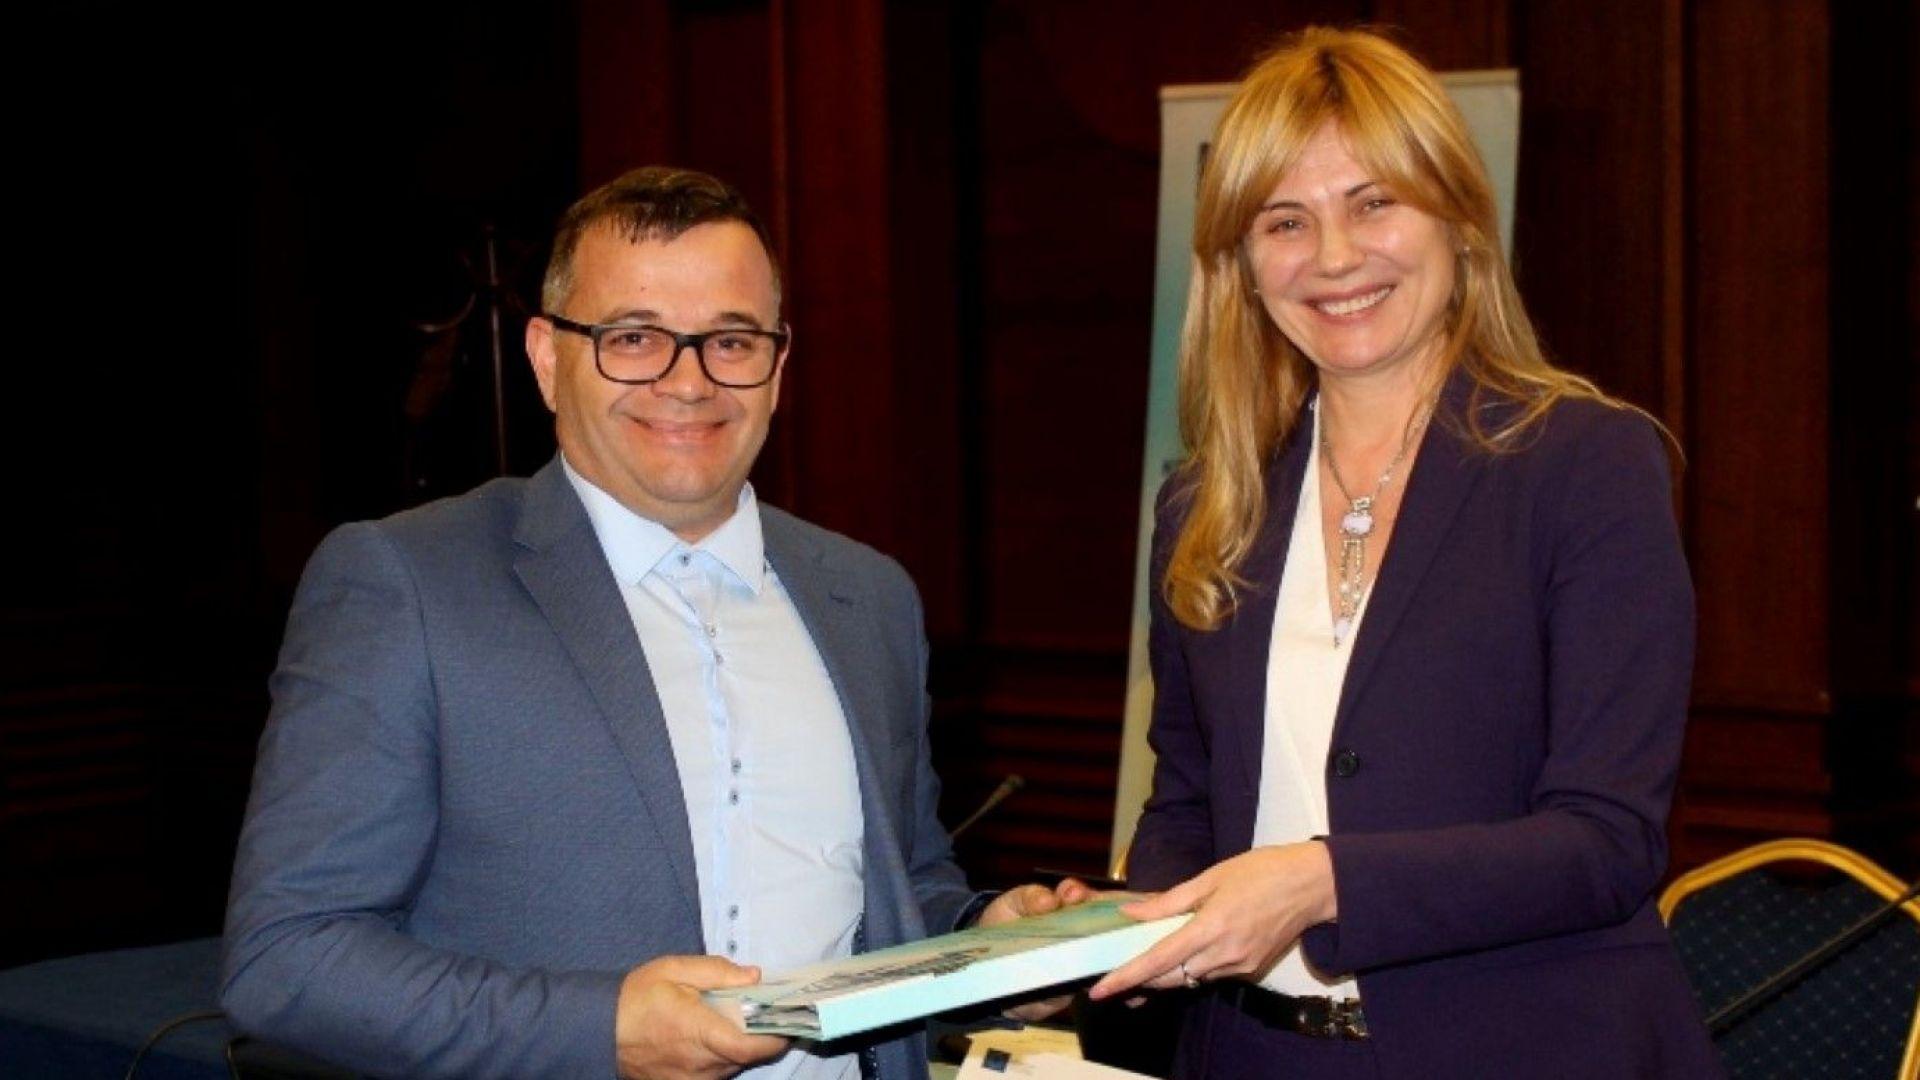 МИ връчи договори за 340 проекта по ОПИК за 143 млн. лева